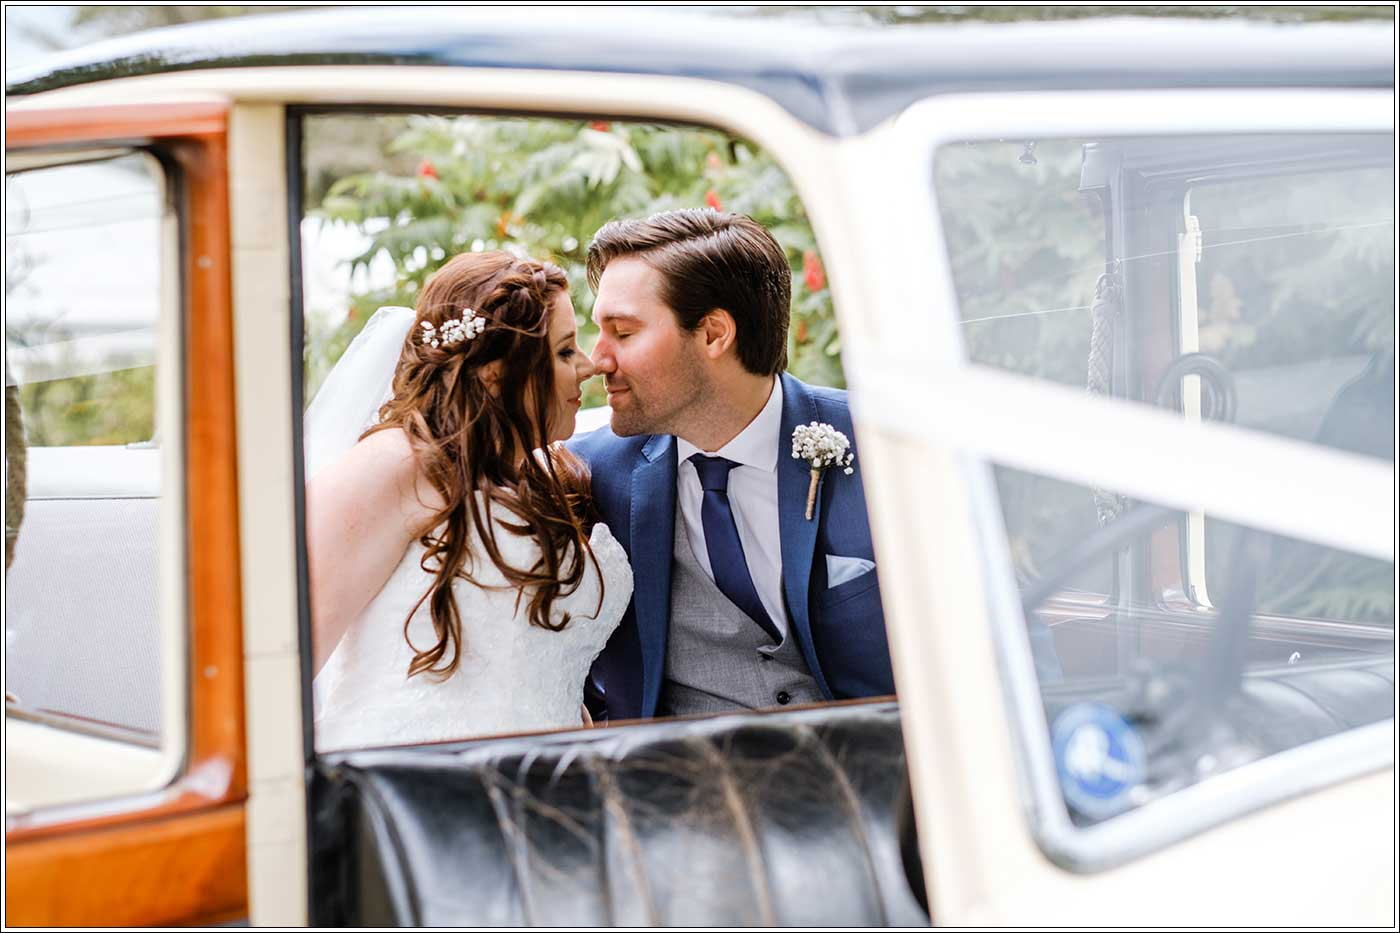 Groom and bride in weddintg car